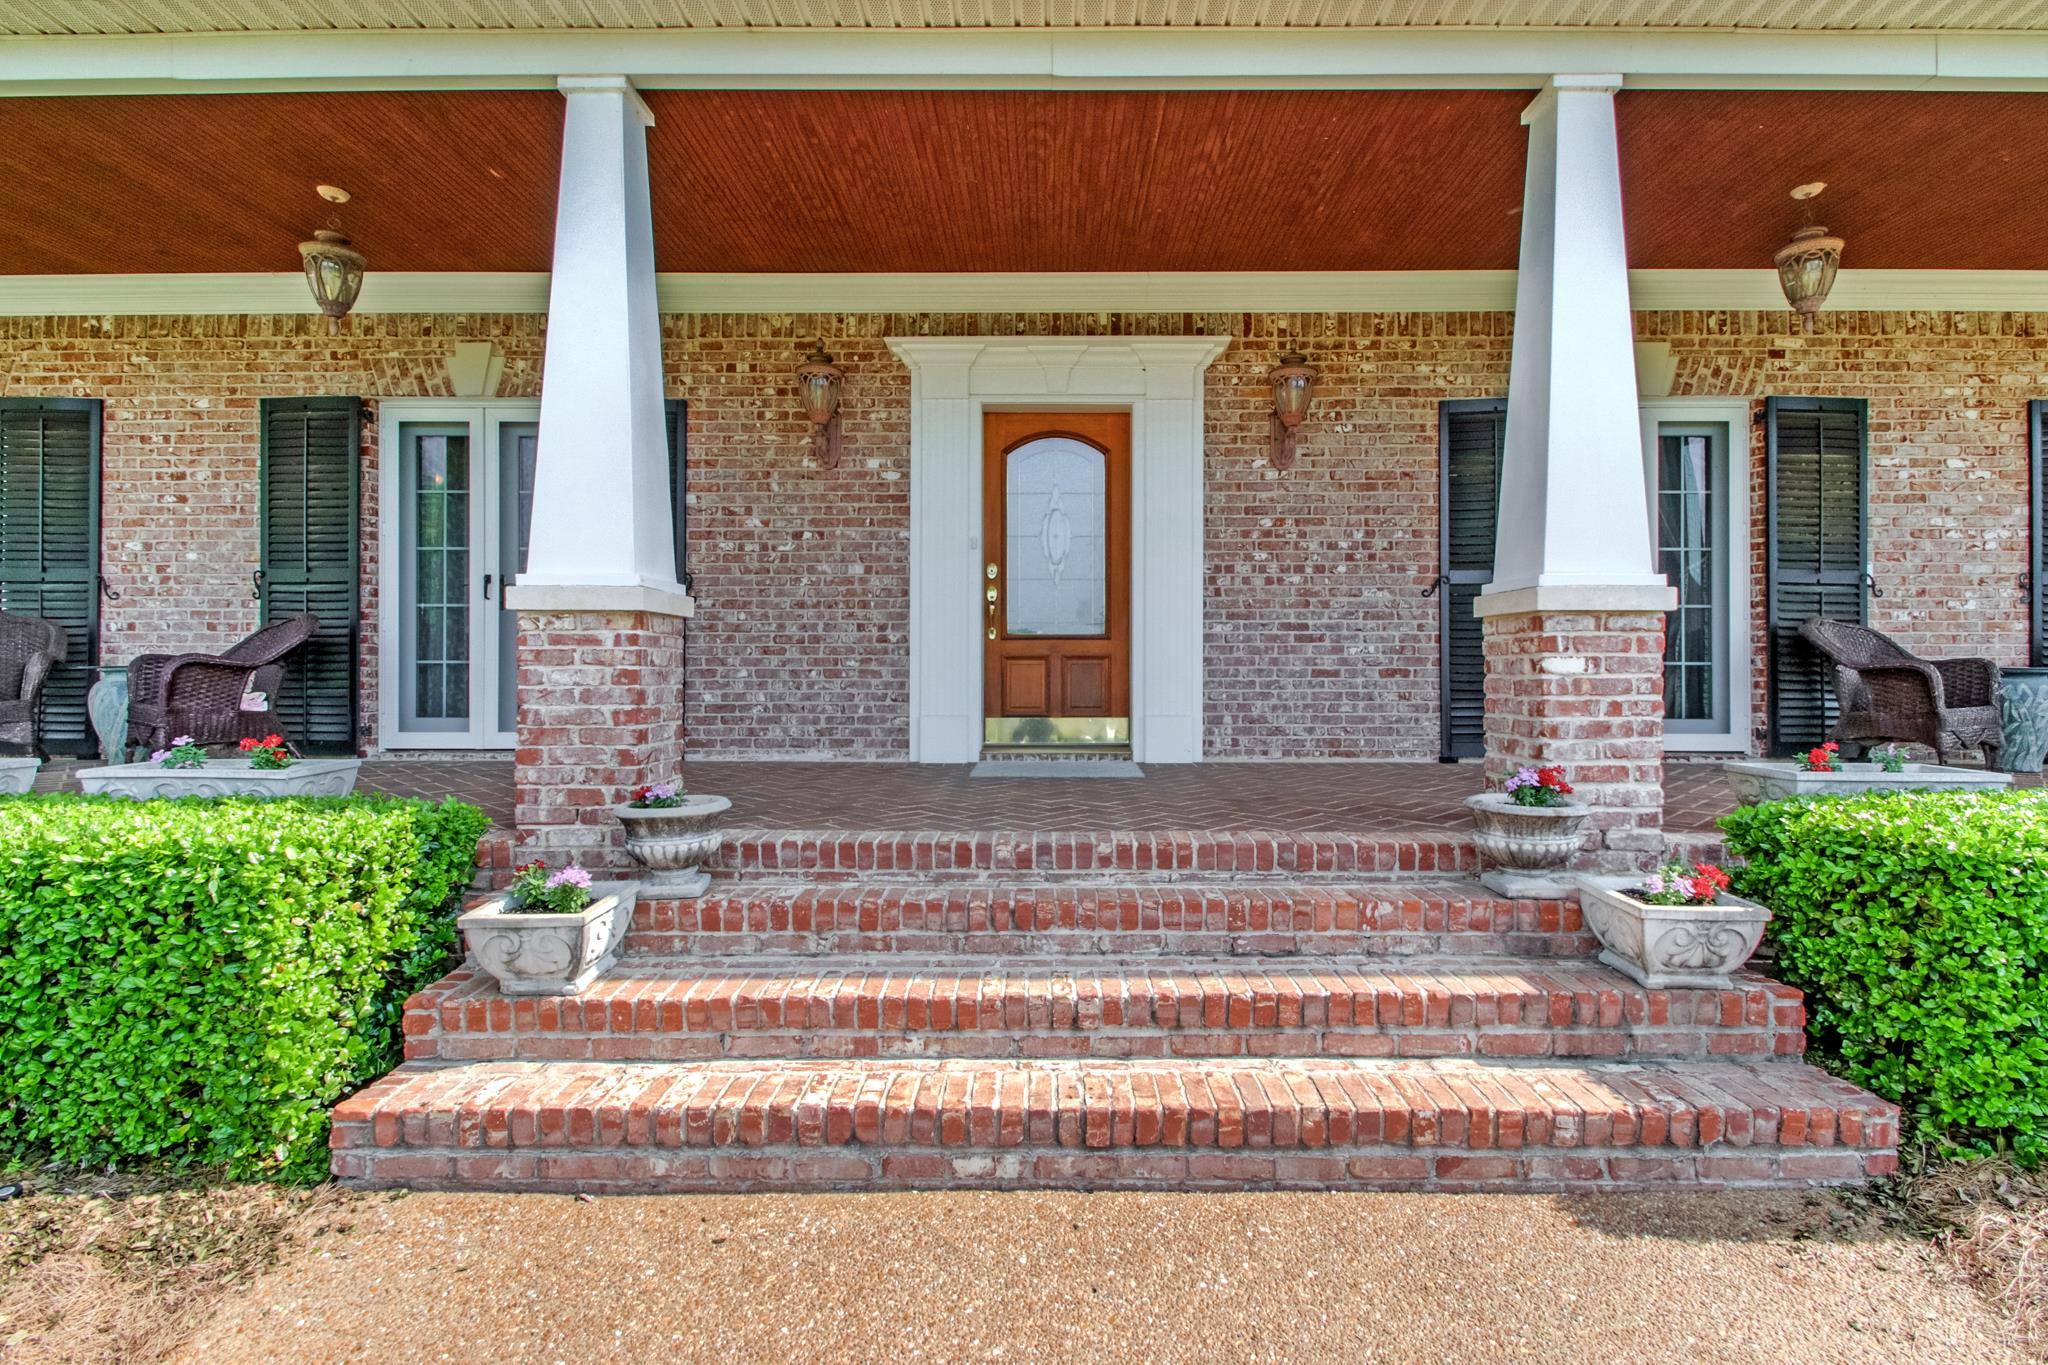 3435 Meadowcrest Dr, Murfreesboro, TN 37129 - Murfreesboro, TN real estate listing